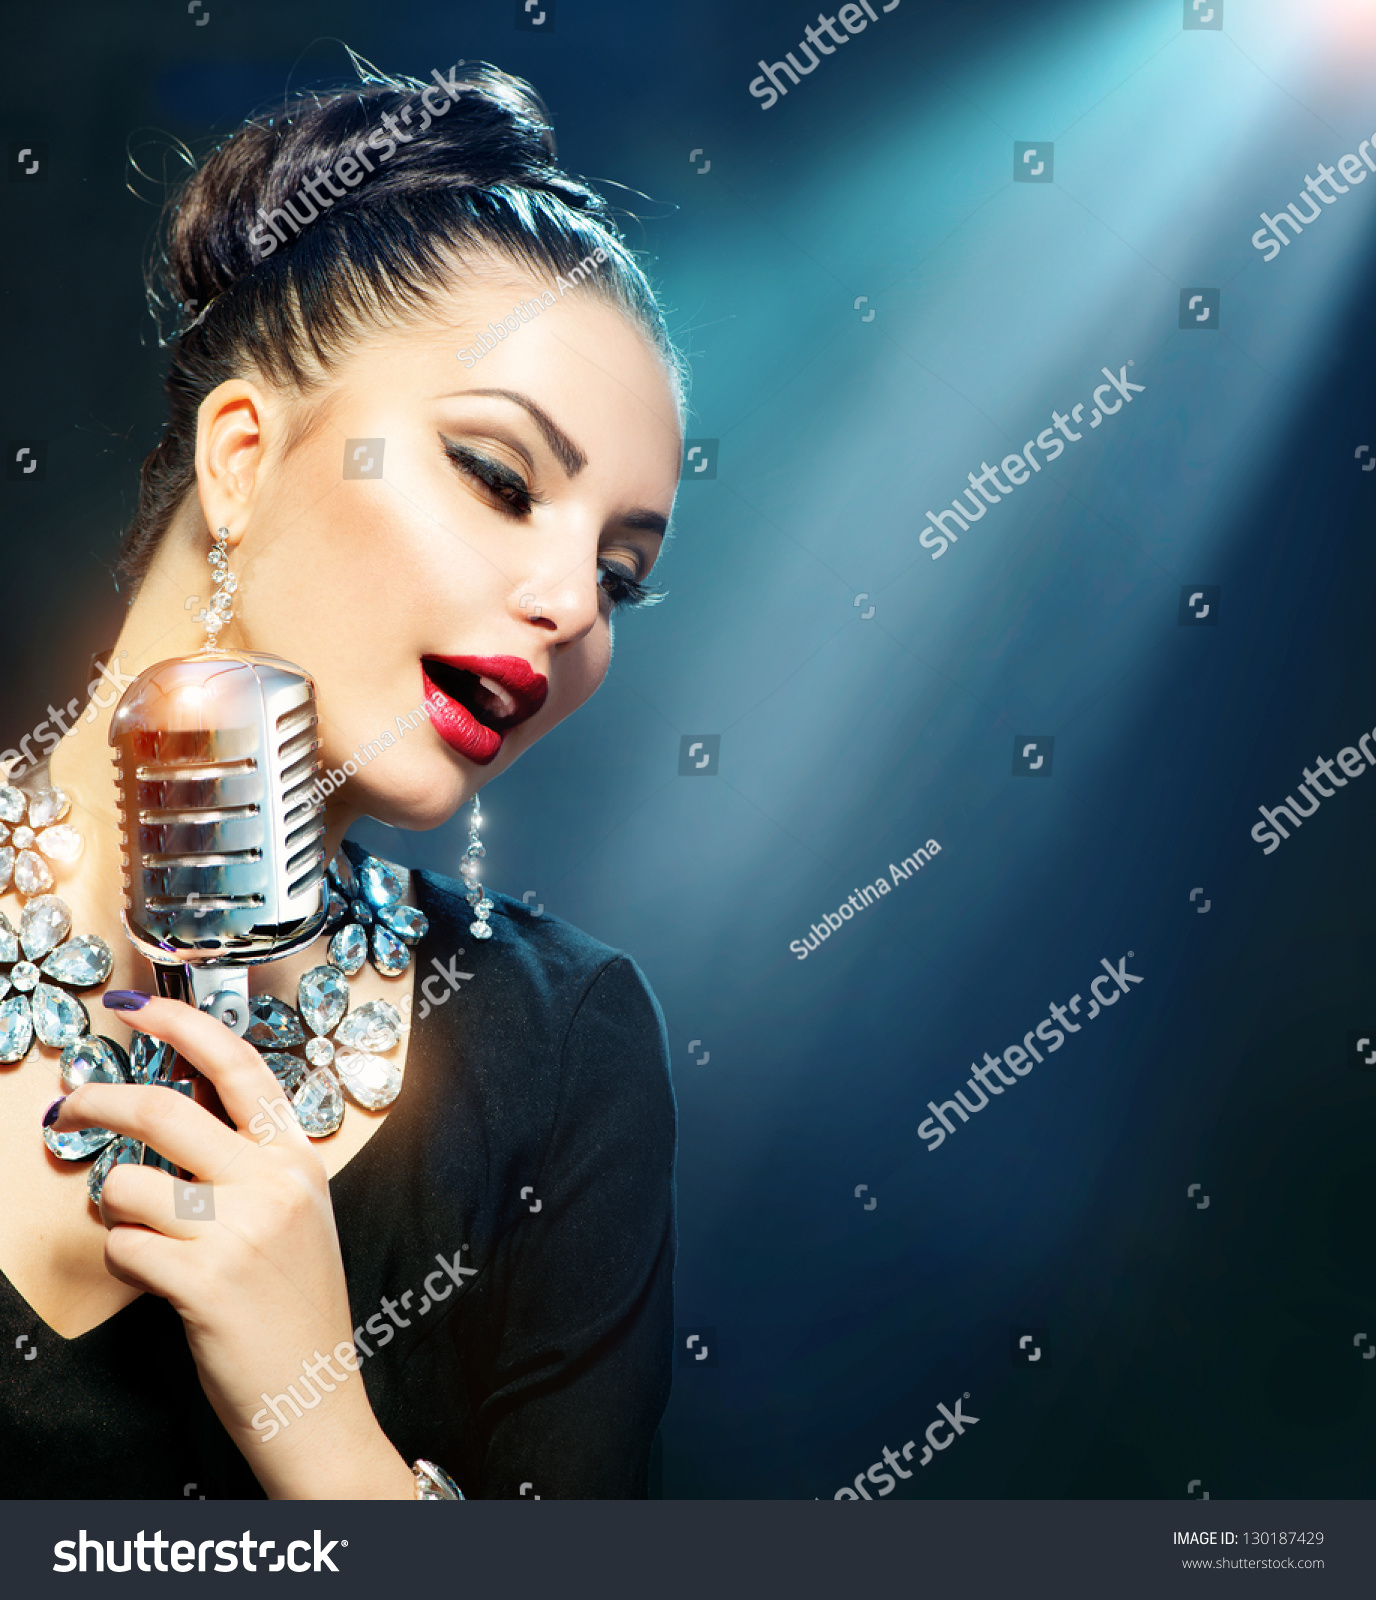 singing the girl retro - photo #3